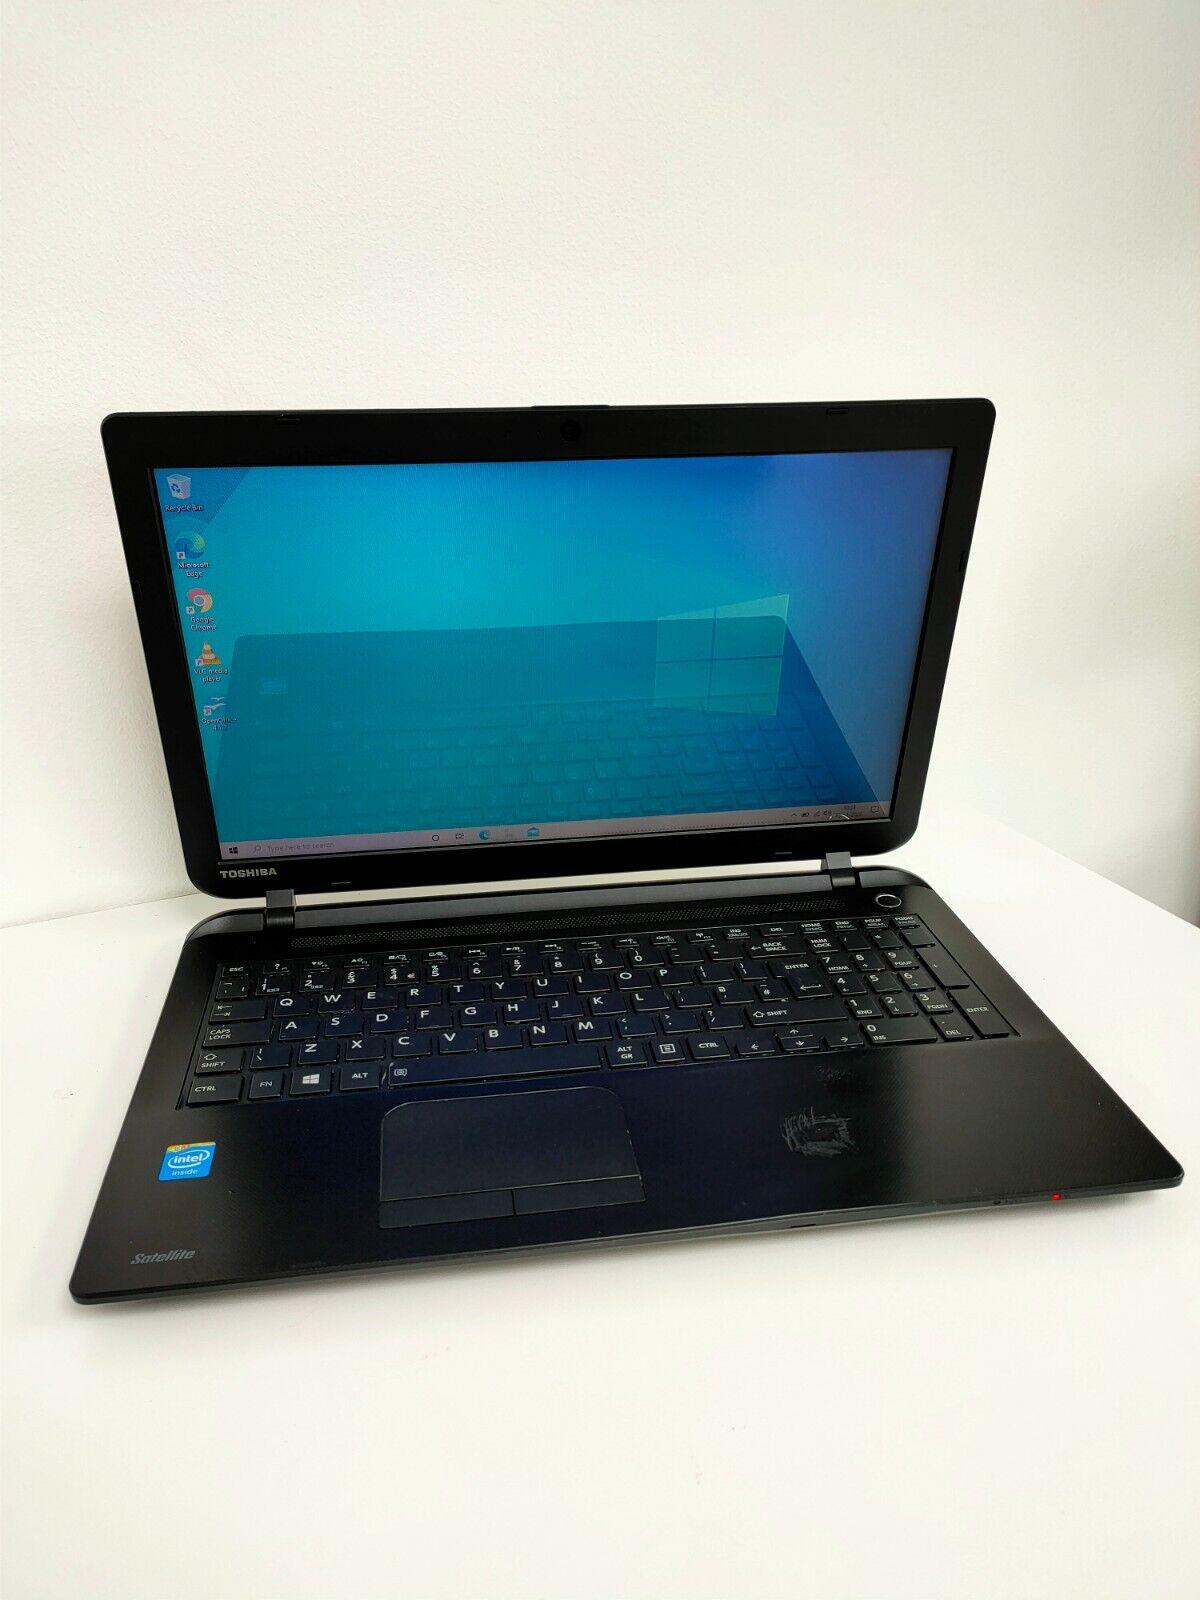 "Laptop Windows - Toshiba Satellite C50-B 15.6"" Laptop Intel Celeron 4GB RAM 500GB HDD Windows 10"